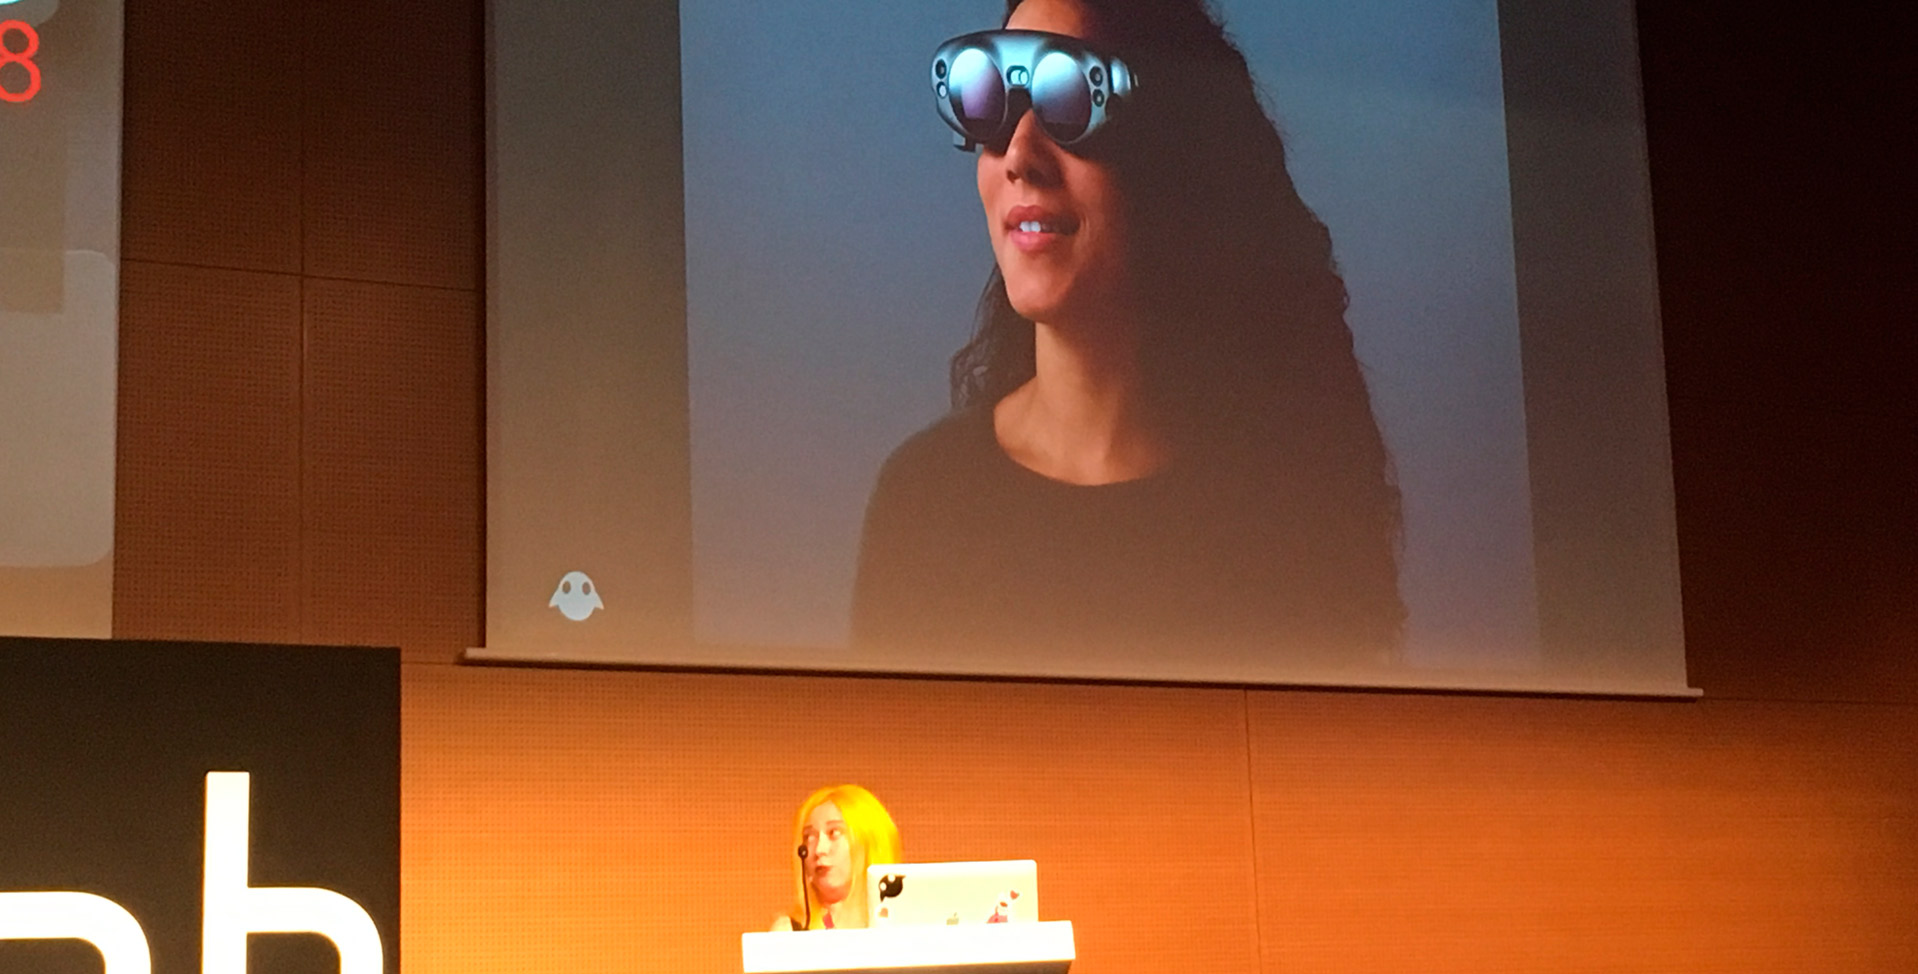 Conferencia de Aleissa Laidacker en GameLab Barcelona 2018. BaseTIS.